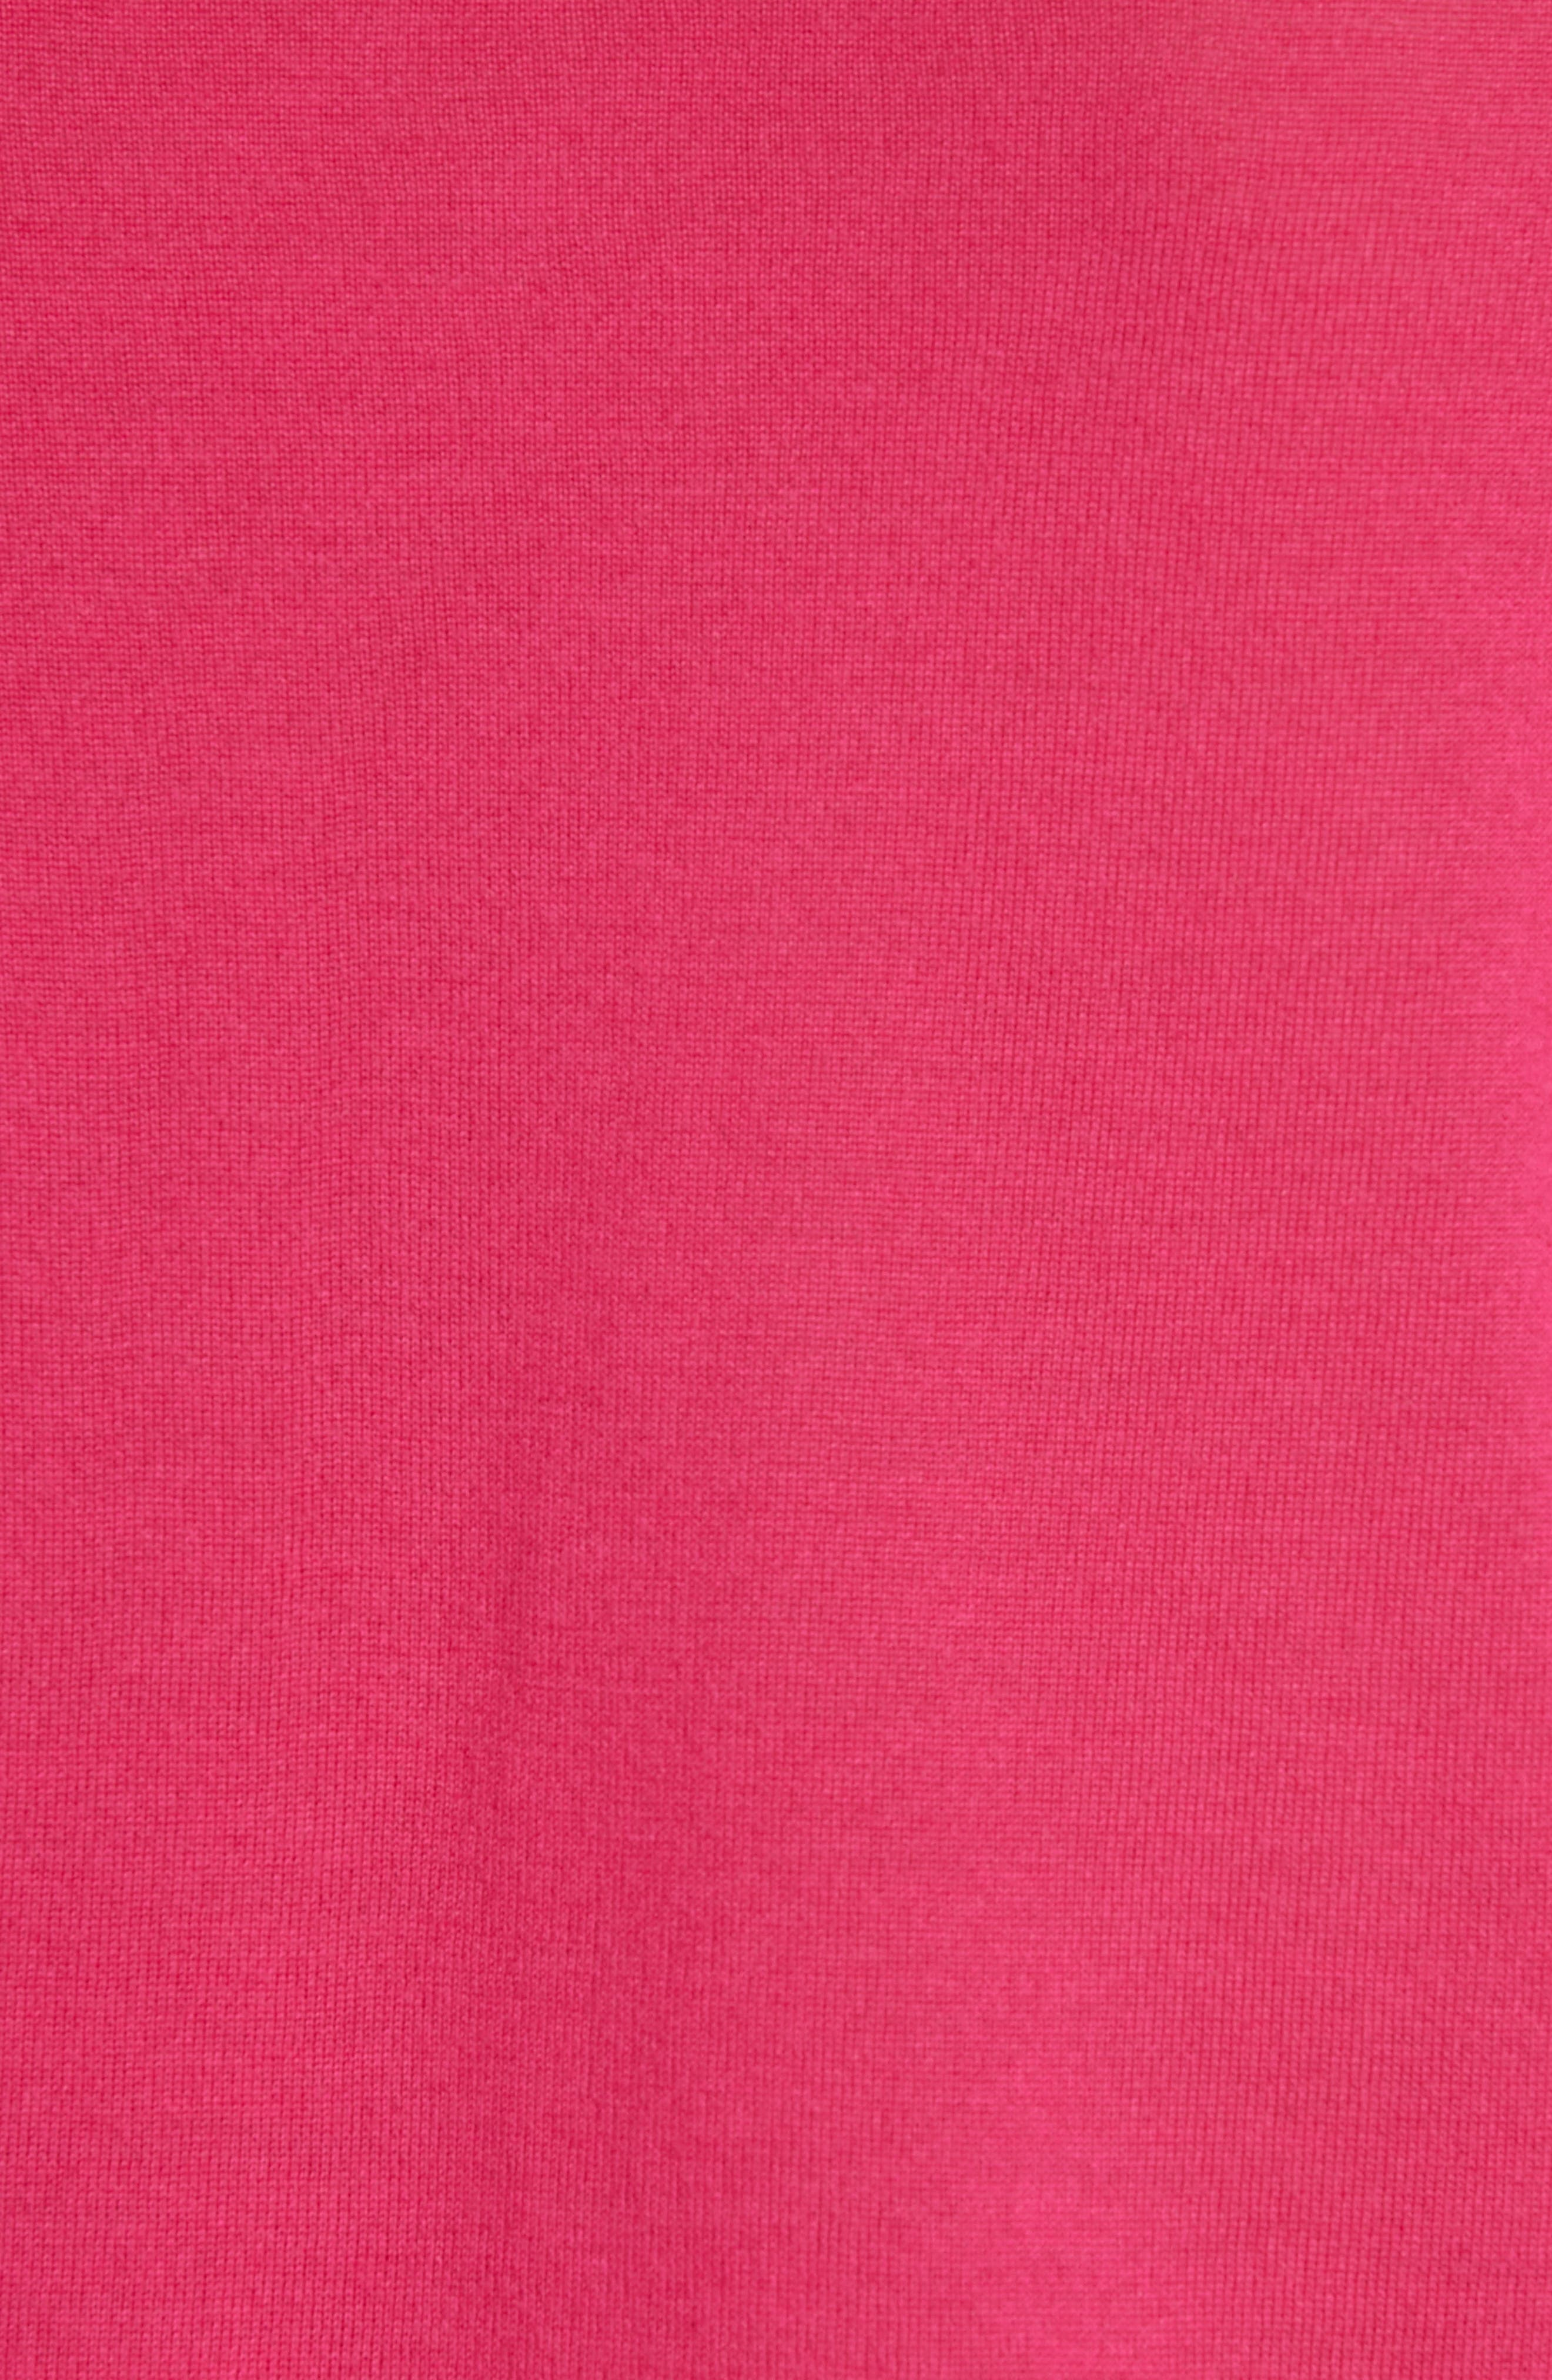 Filomeni Wool Cardigan,                             Alternate thumbnail 5, color,                             DEEP PLUMBERRY